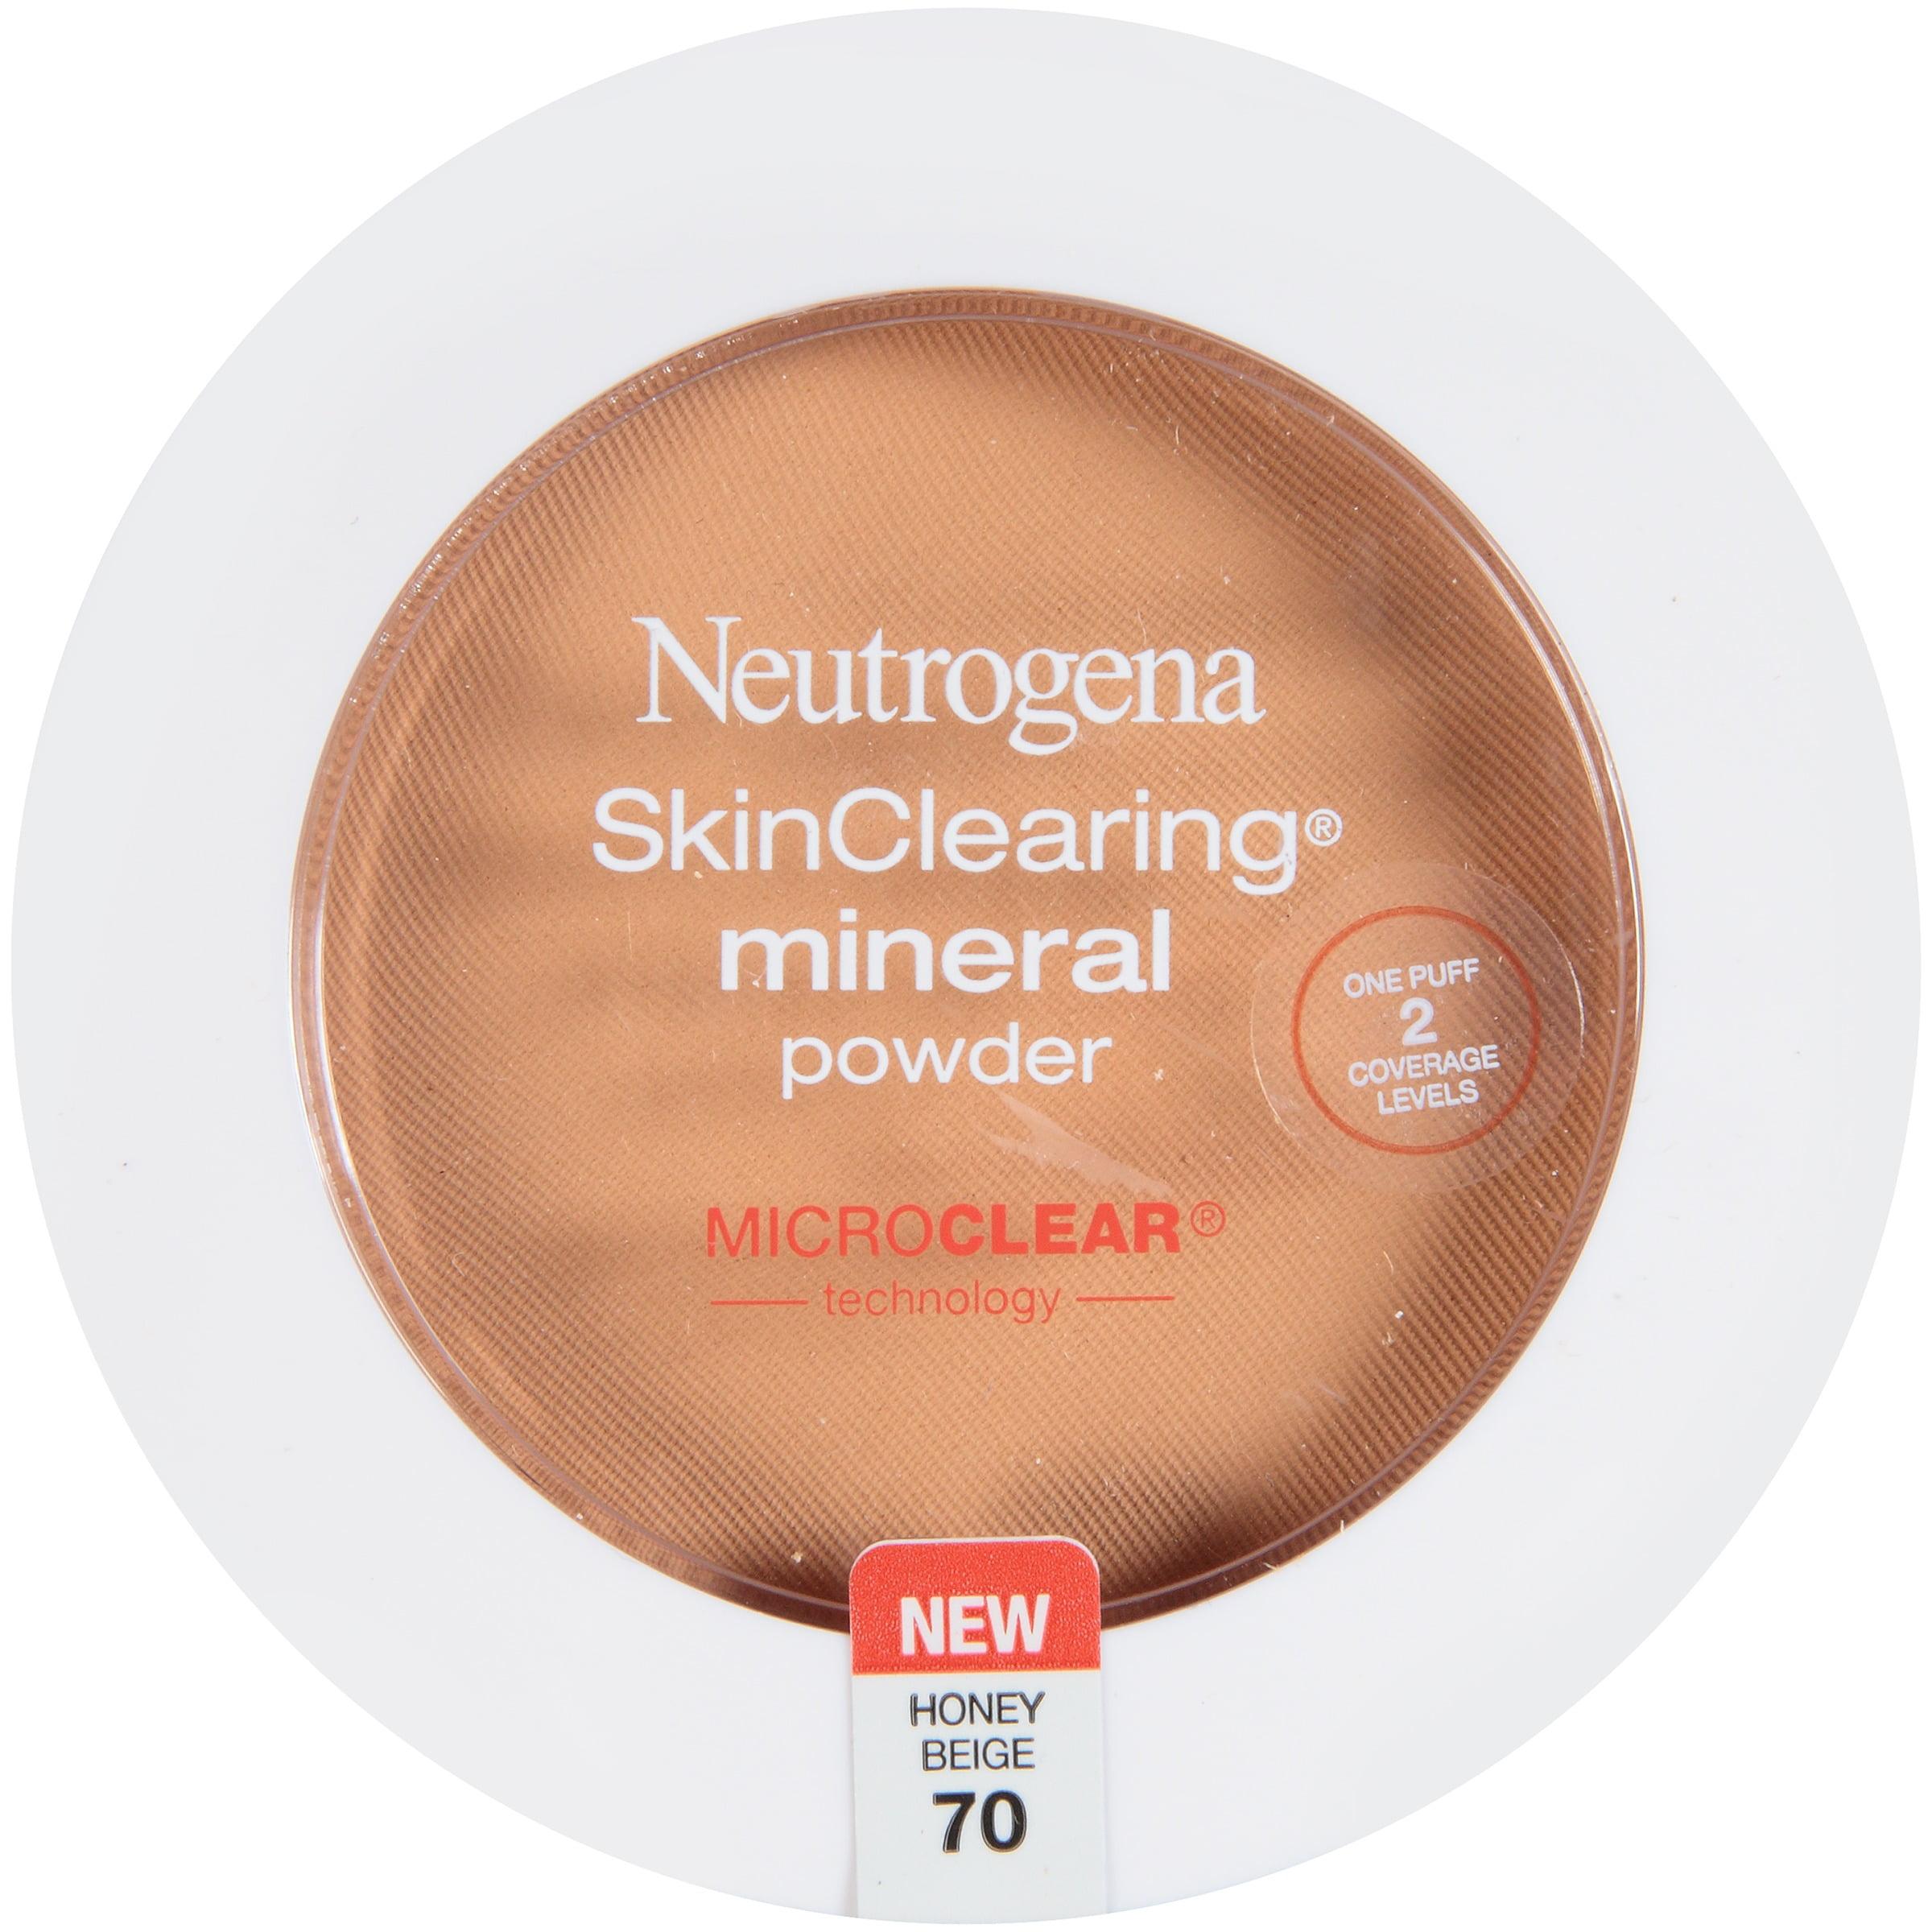 Maquillaje Para Ojos Neutrogena Skinclearing Mineral polvo, Beige Miel 70,.38 Oz + Neutrogena en Veo y Compro